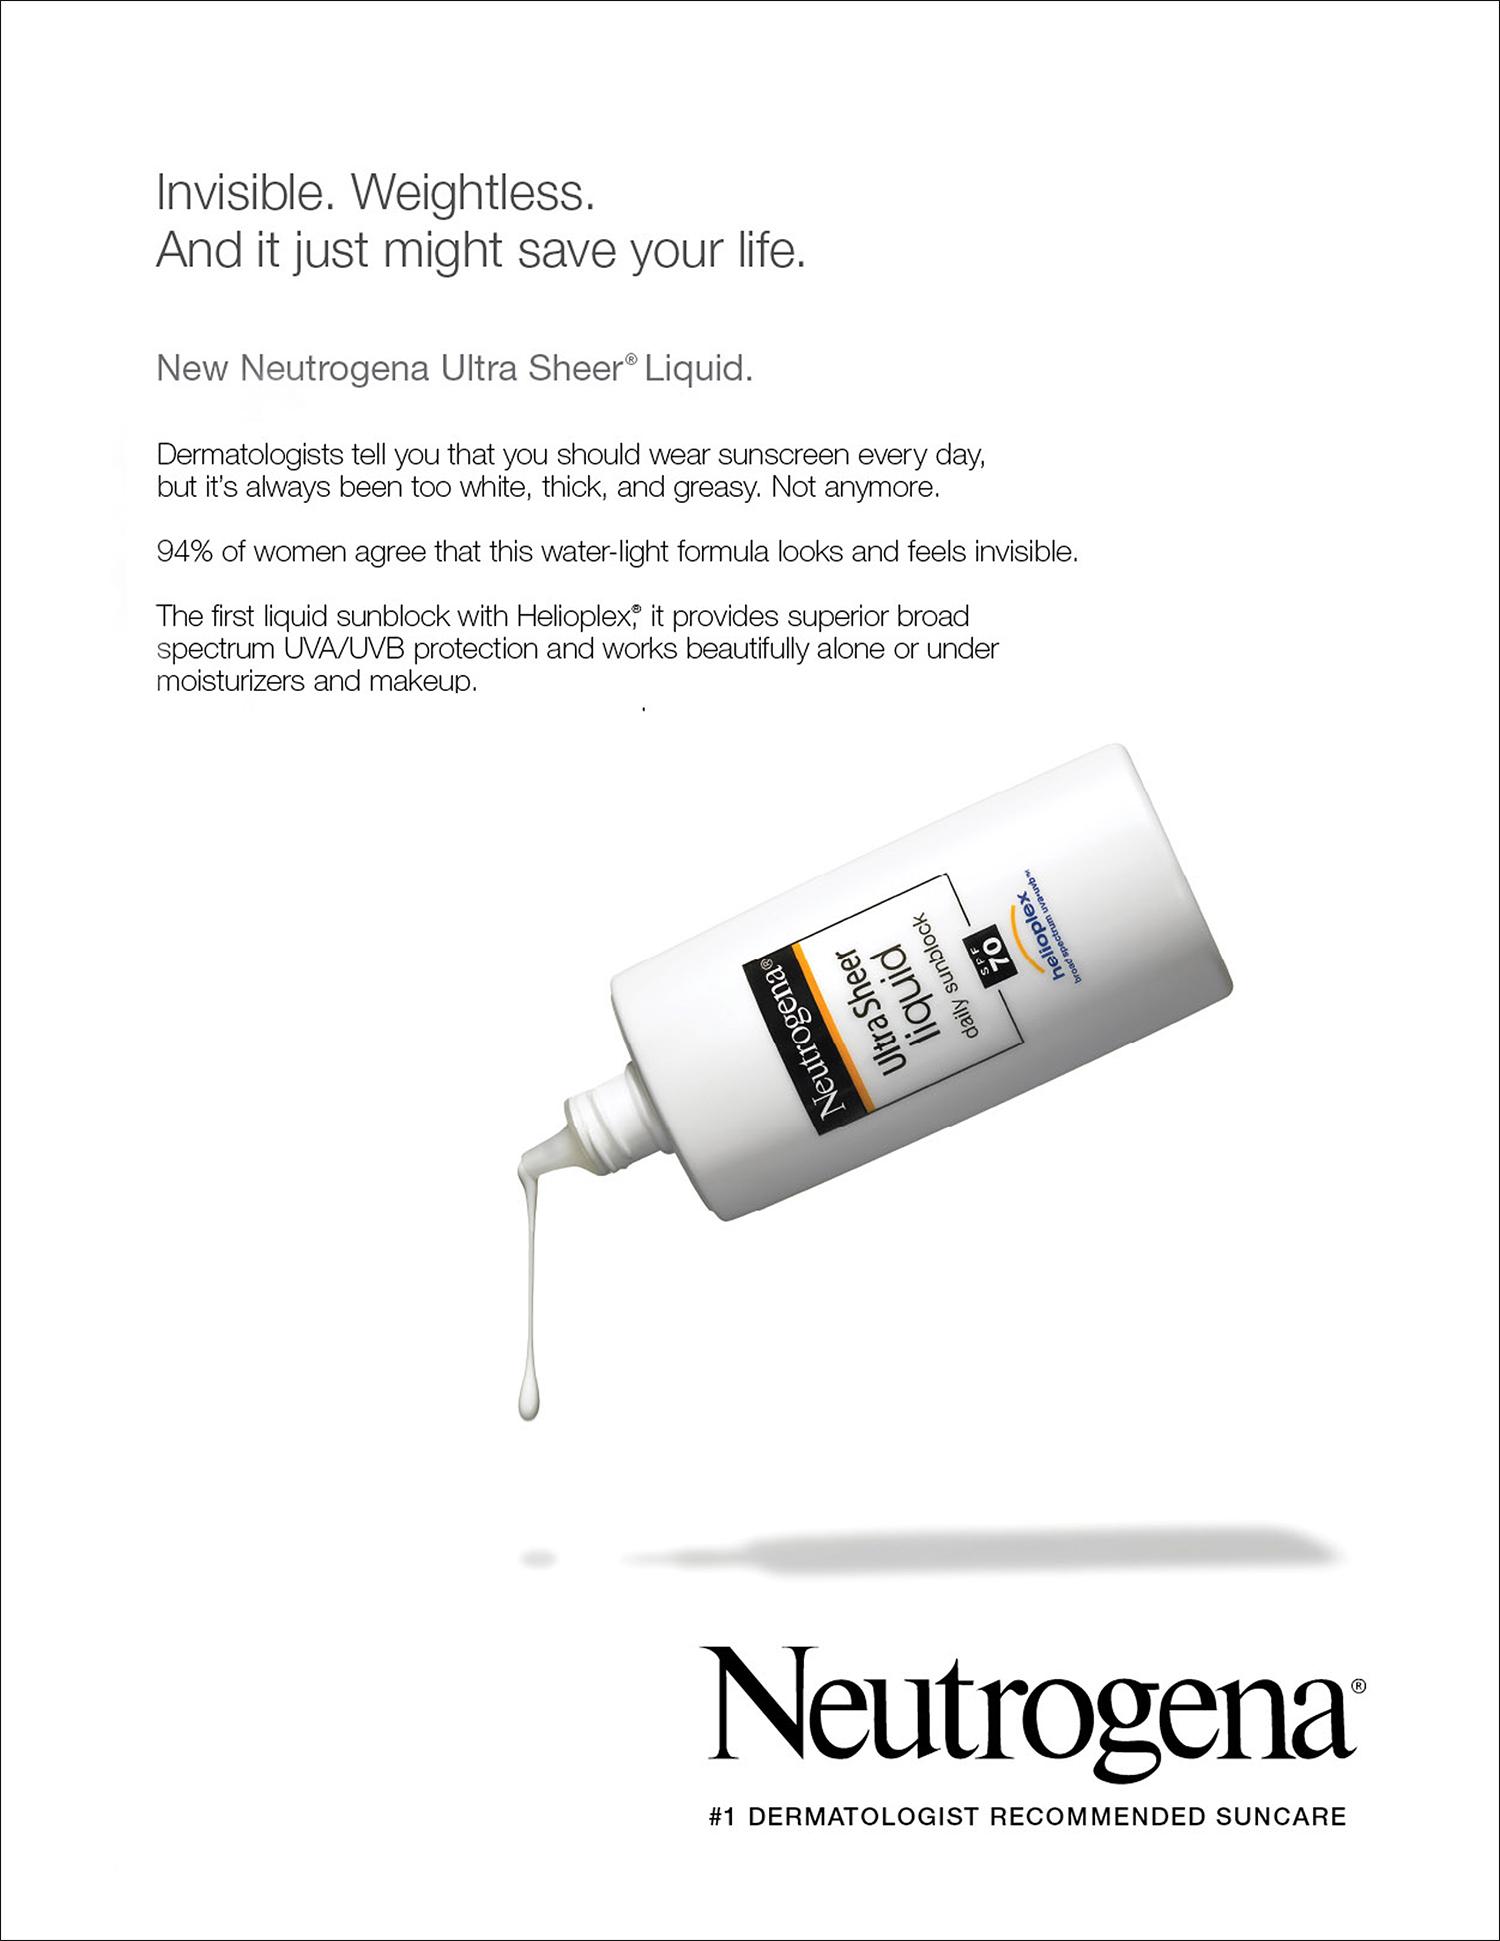 Neutrogena (Invisible)